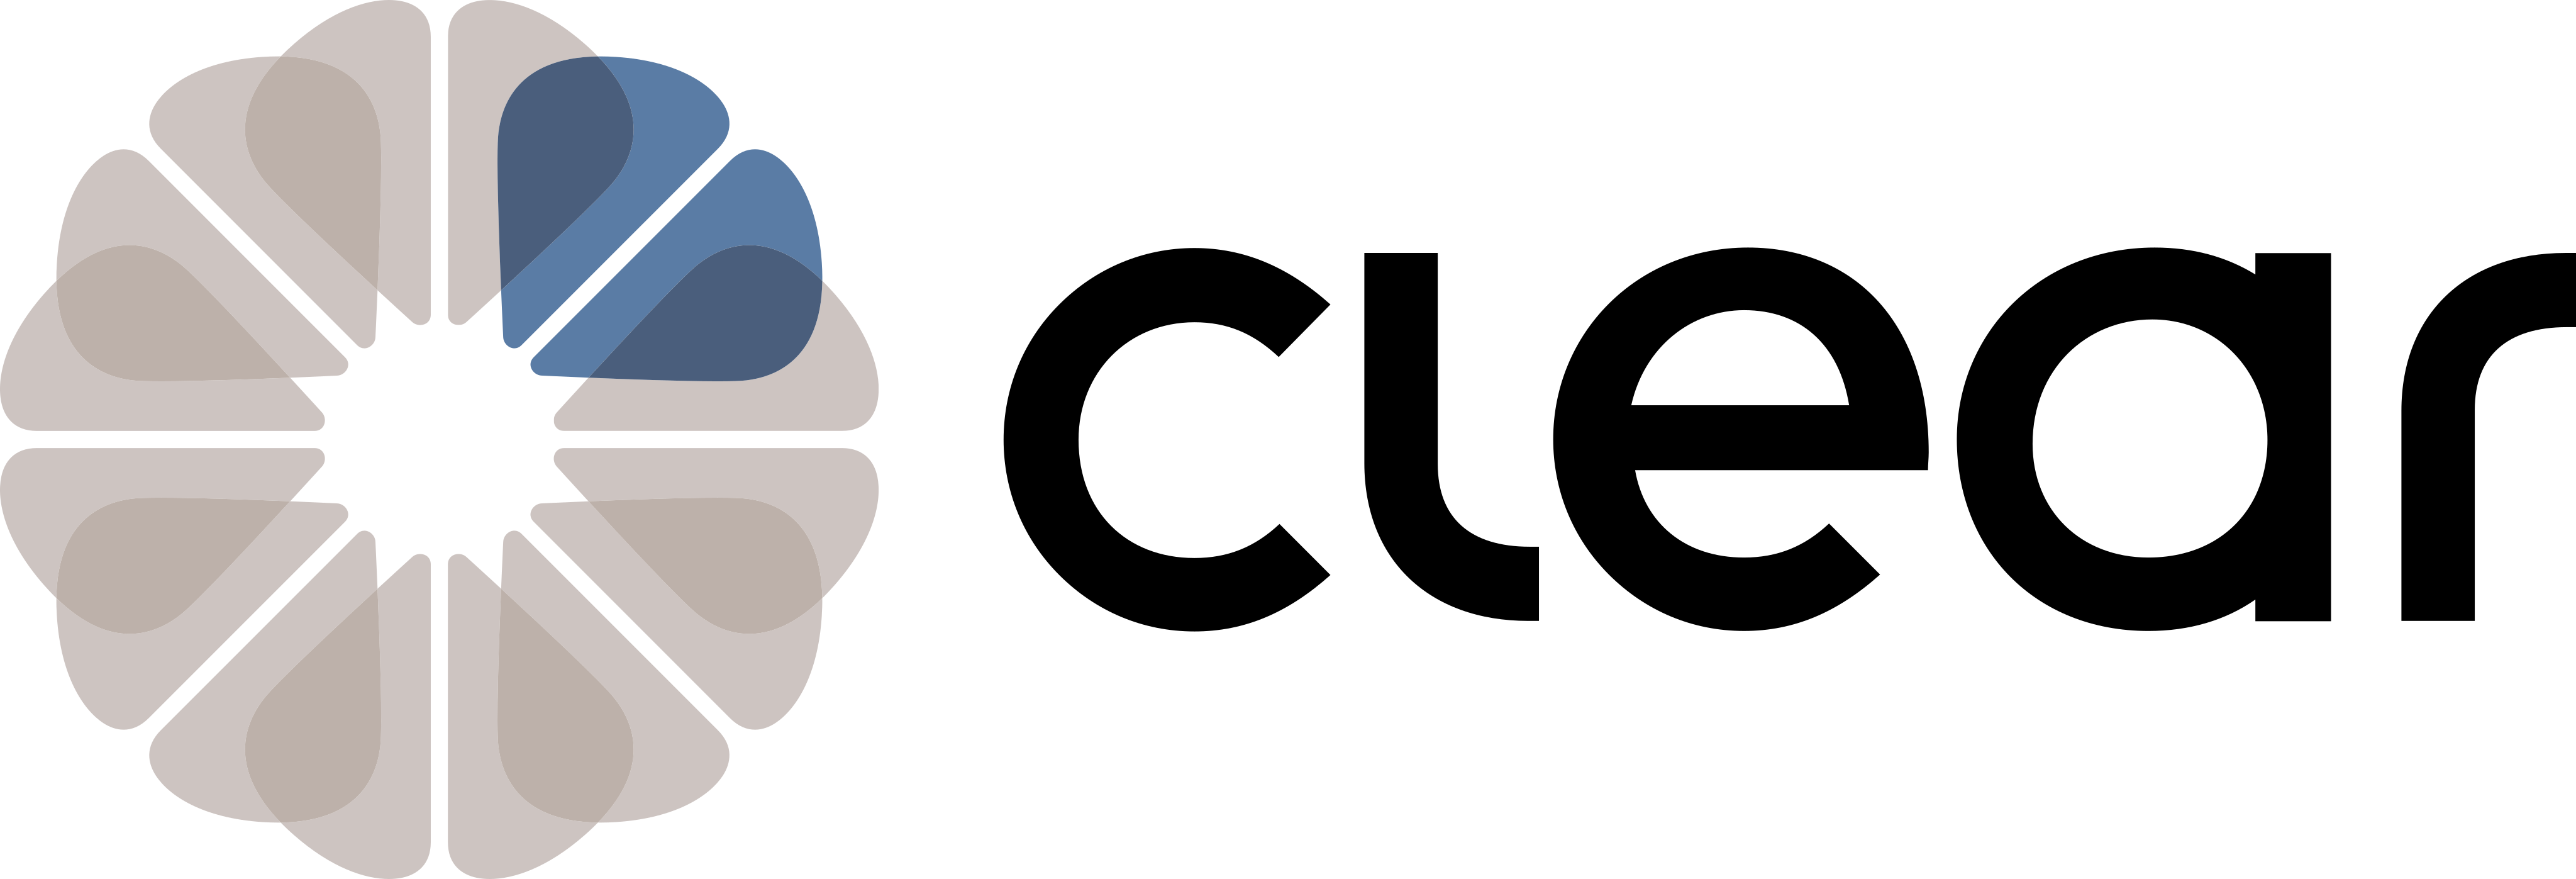 Clear Corretora Logo.